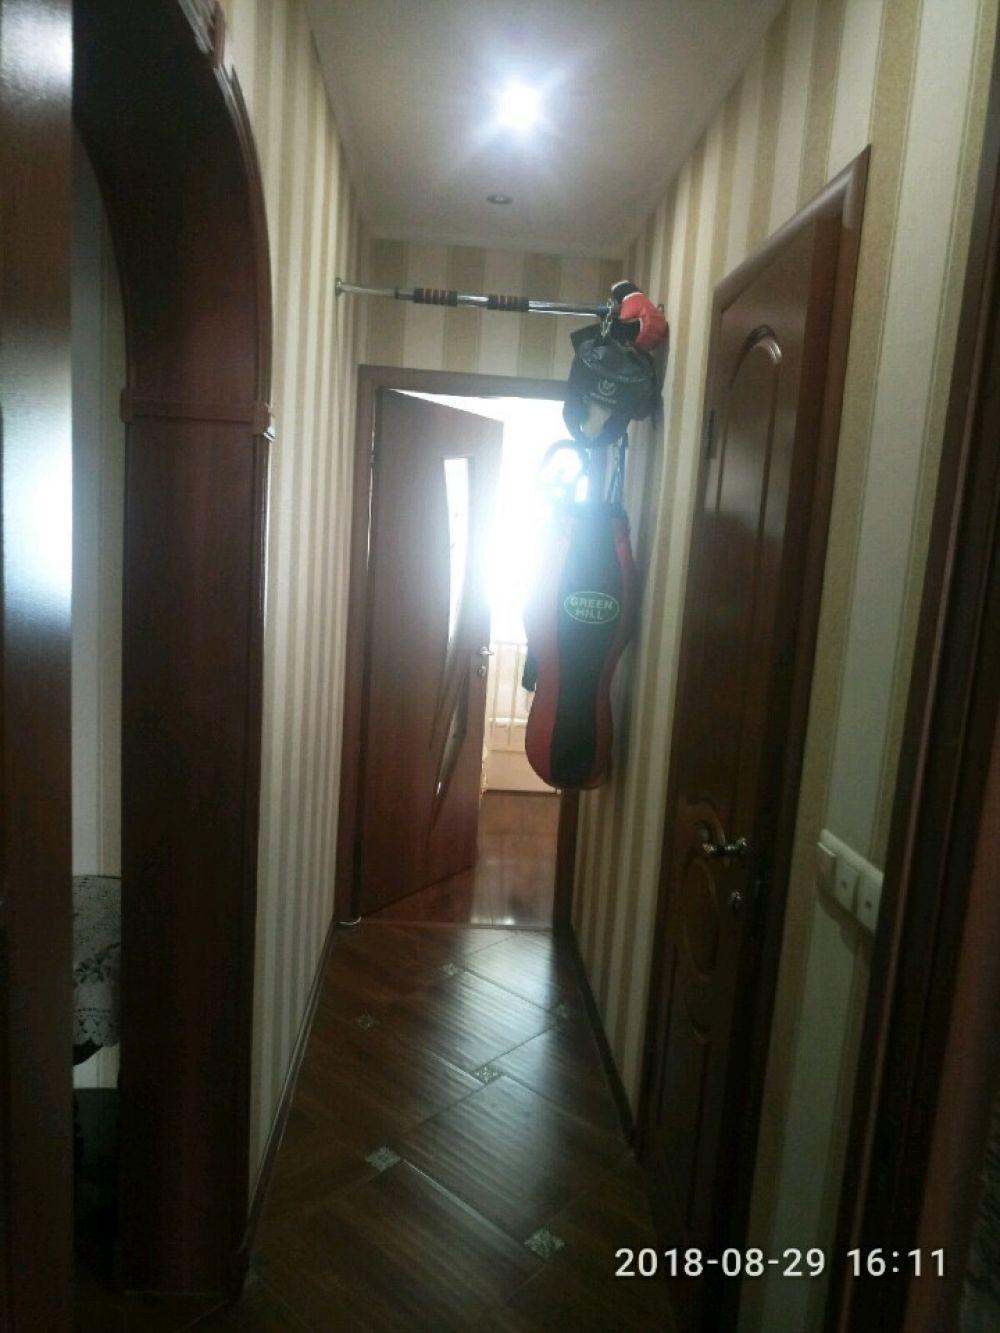 2-к квартира, 56 м2, 7/16 эт. Фрязино, ул горького д.  7, фото 4